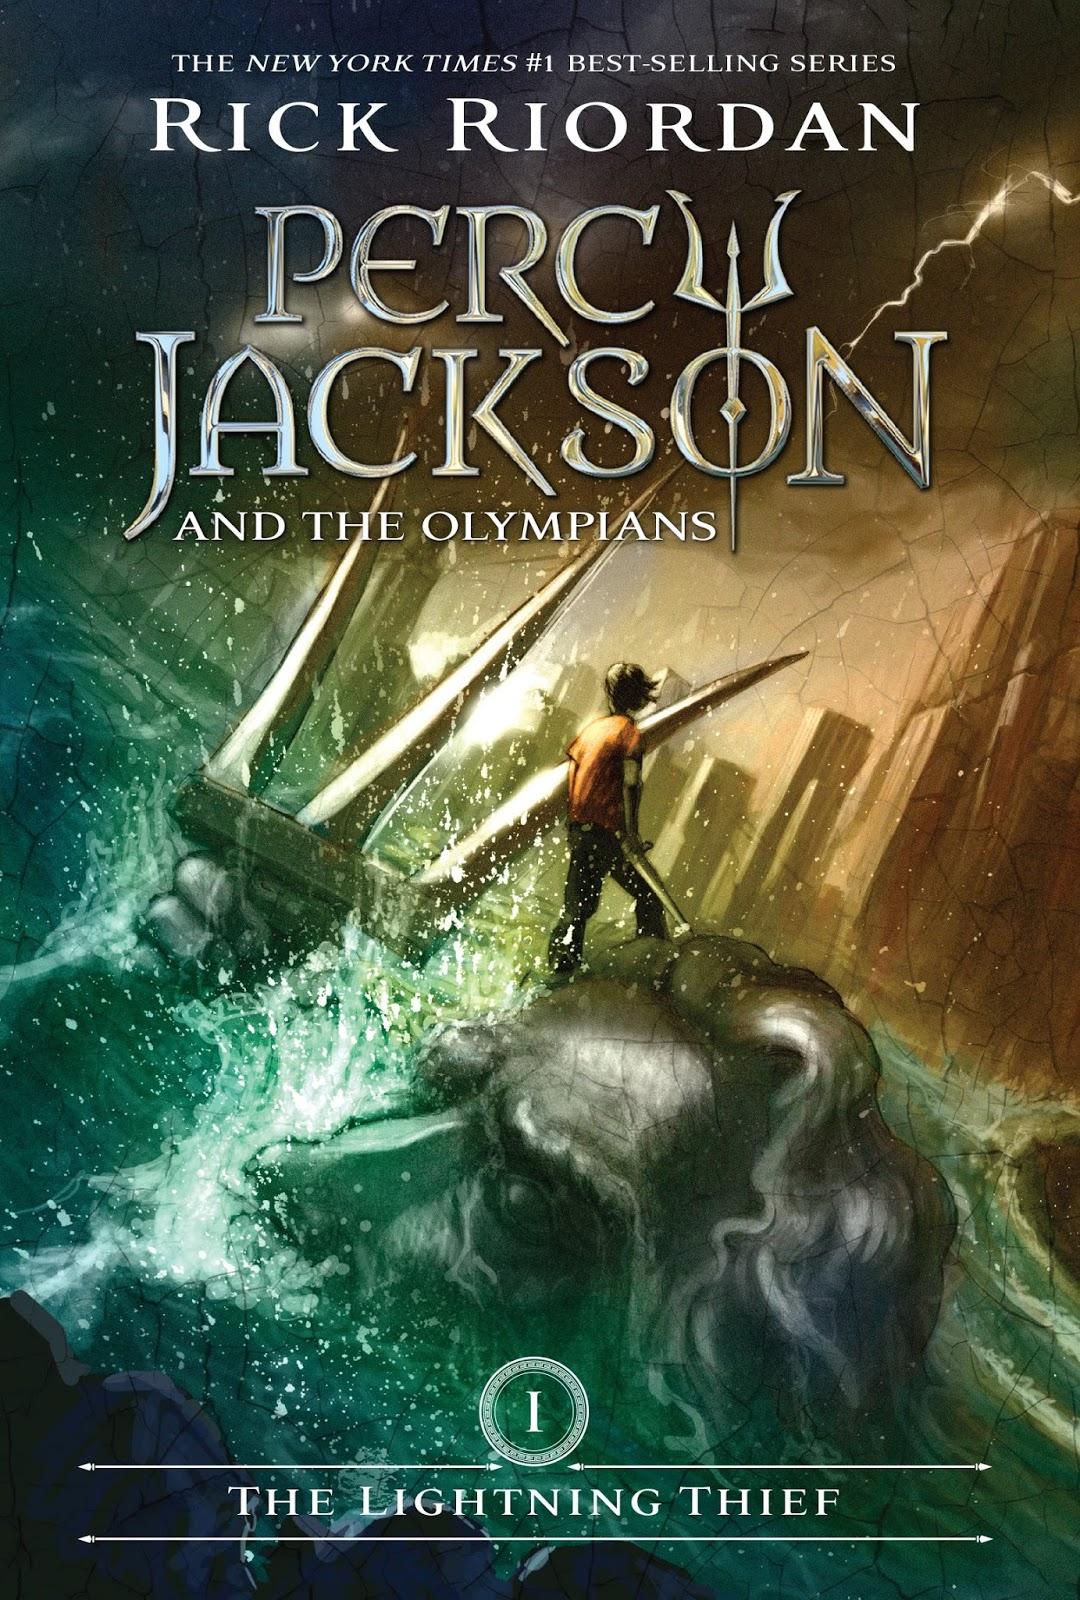 Rick Riordan - Percy Jackson the Olympians - THE LIGHTNING THIEF